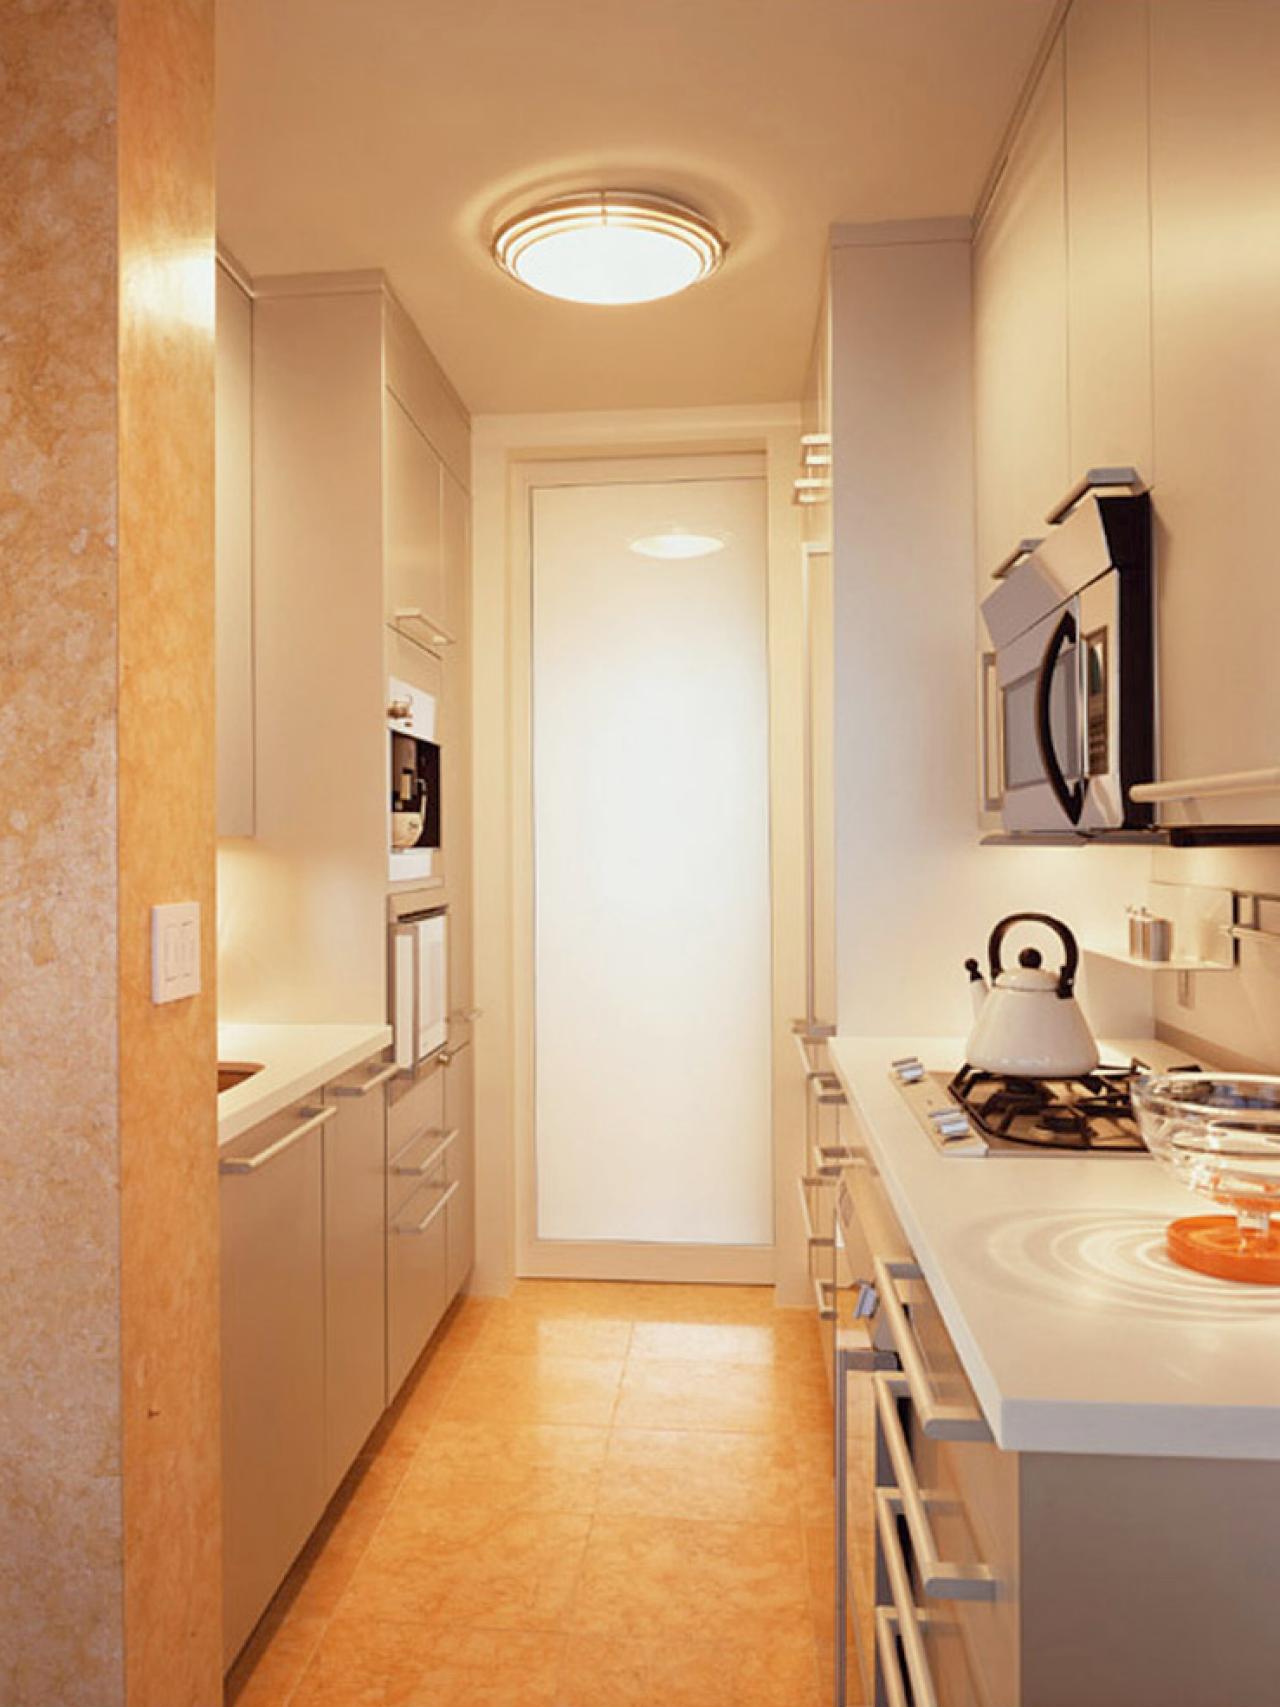 Cute Small Galley Kitchen Design small galley kitchen designs